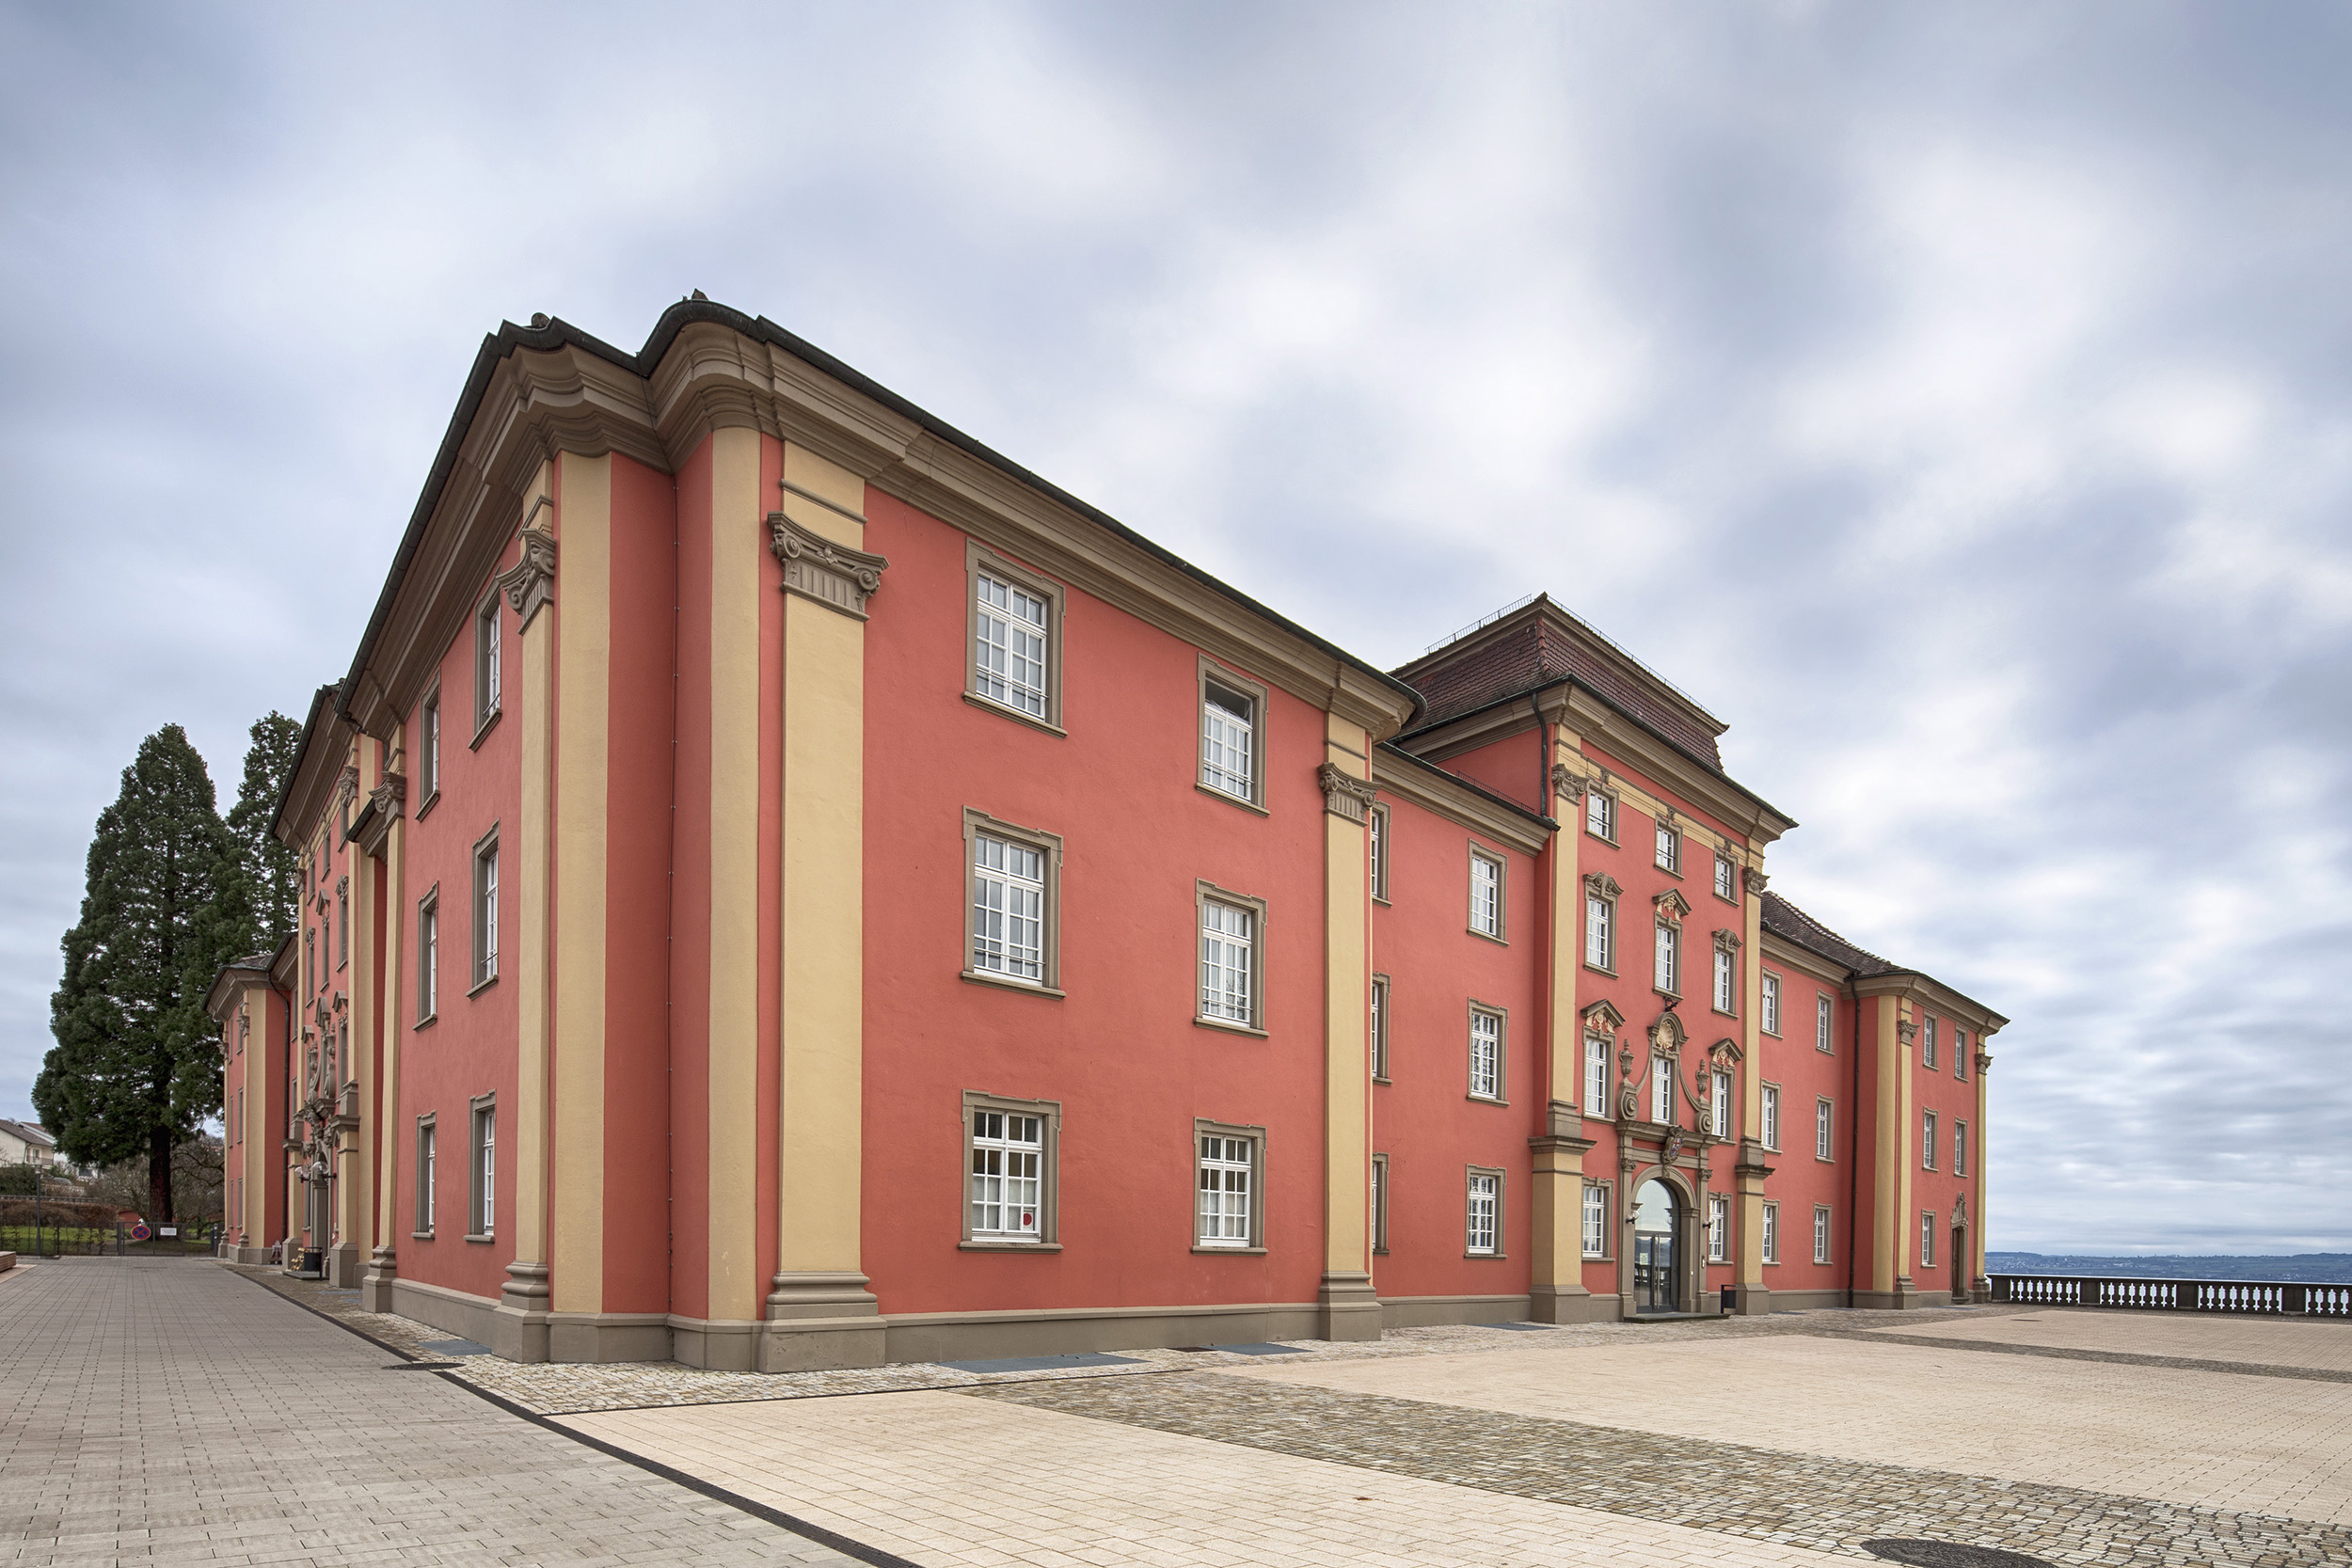 Architekturfoto Anjana Perera - Droste-Hülshoff-Gymnasium Meersburg